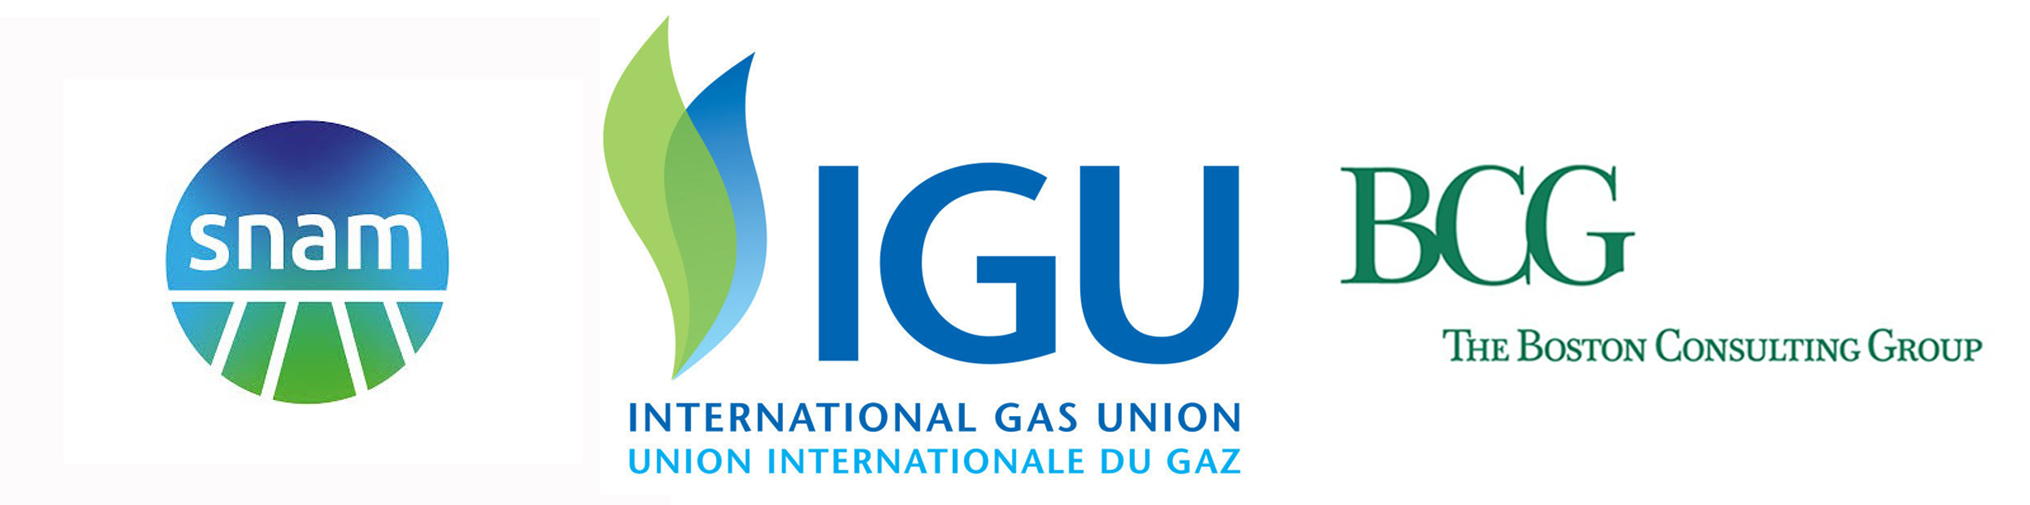 Snam, IGU e BCG, loghi